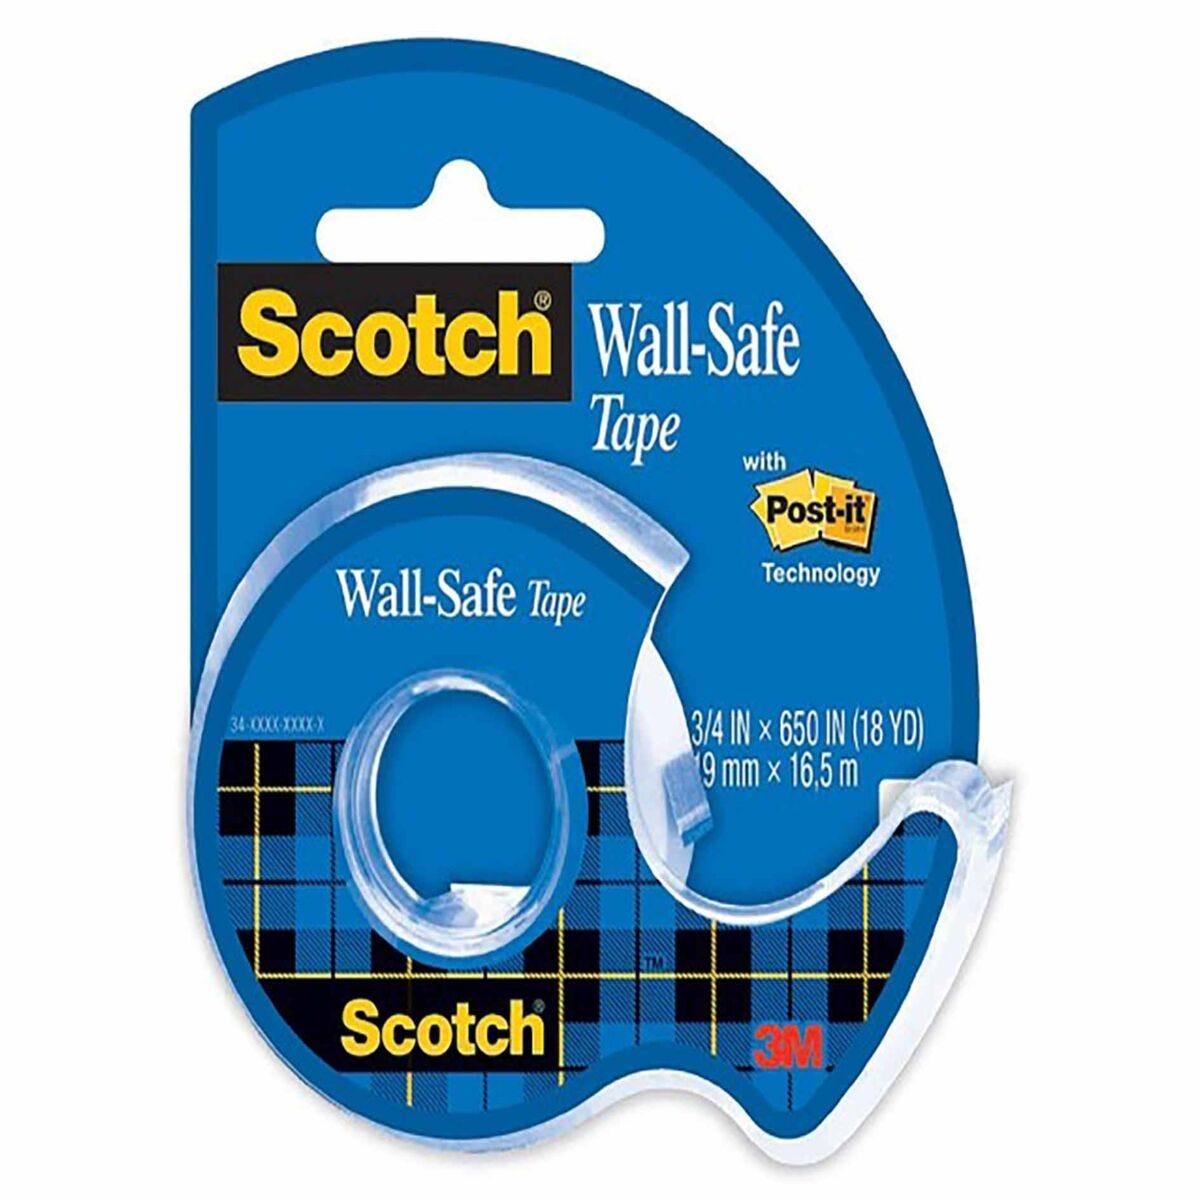 3M Scotch Wall-Safe Tape 19mm x 16.5m